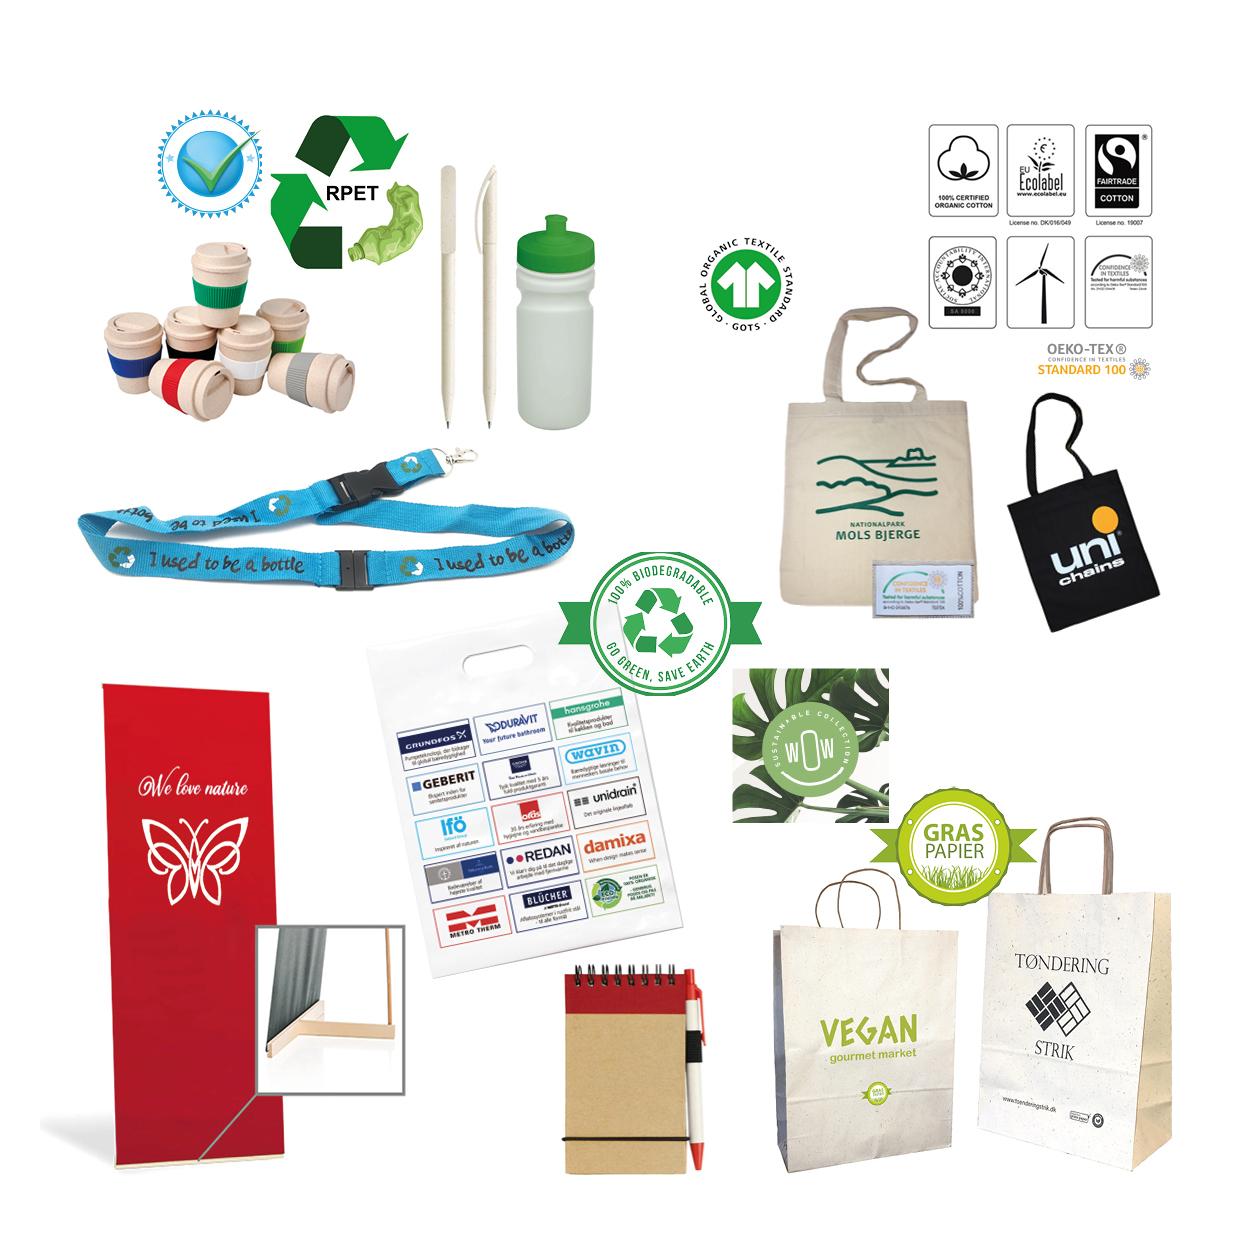 Miljørigtige produkter med logotryk. www.BetterGoGreen.dk